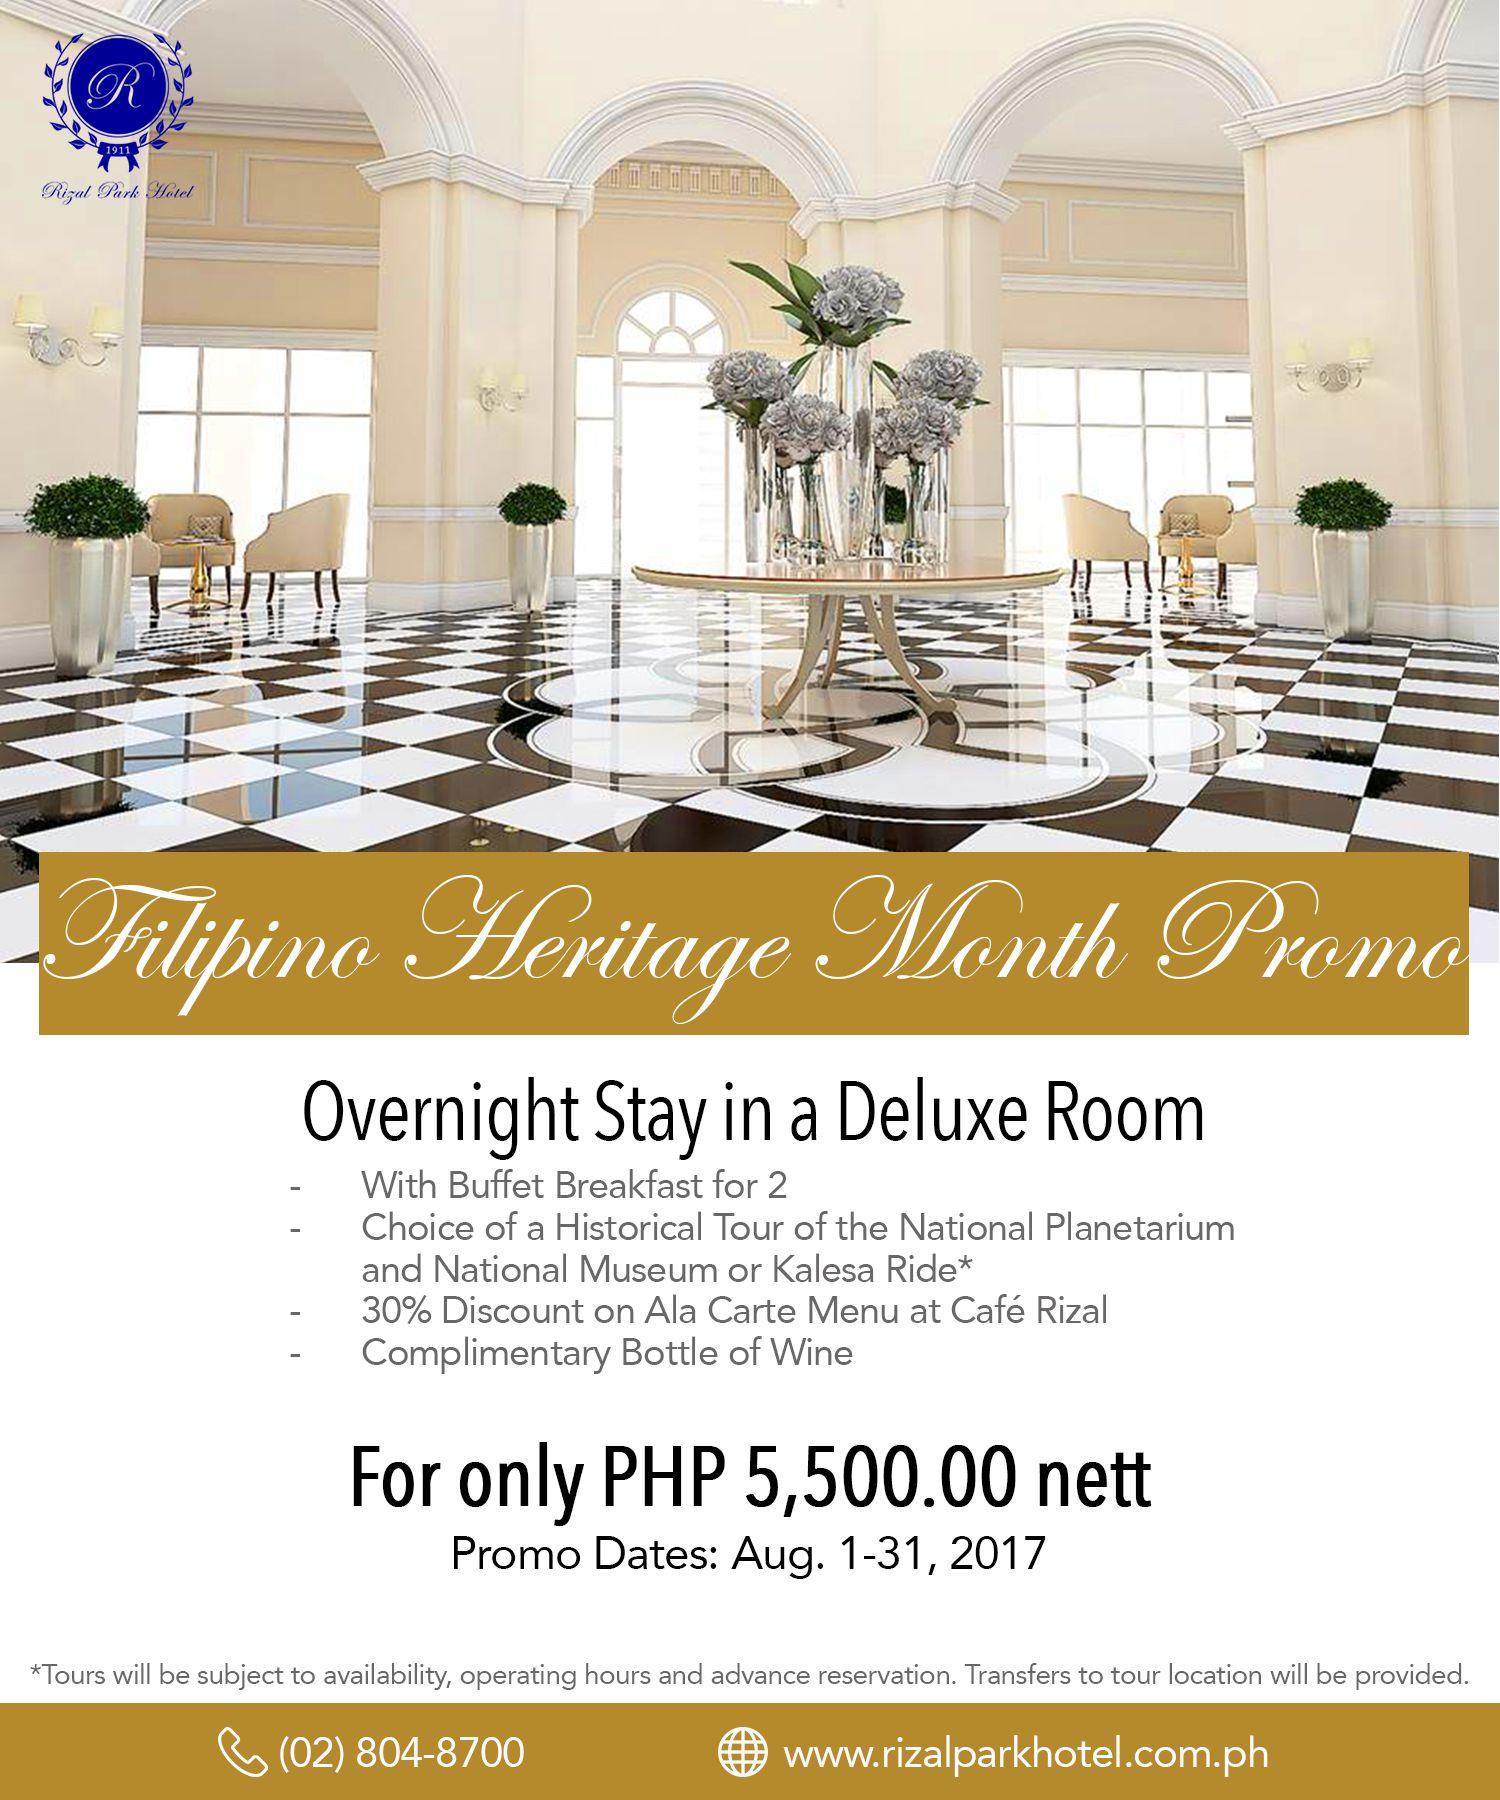 Rizal Park Hotel - Filipino Heritage Month Promo